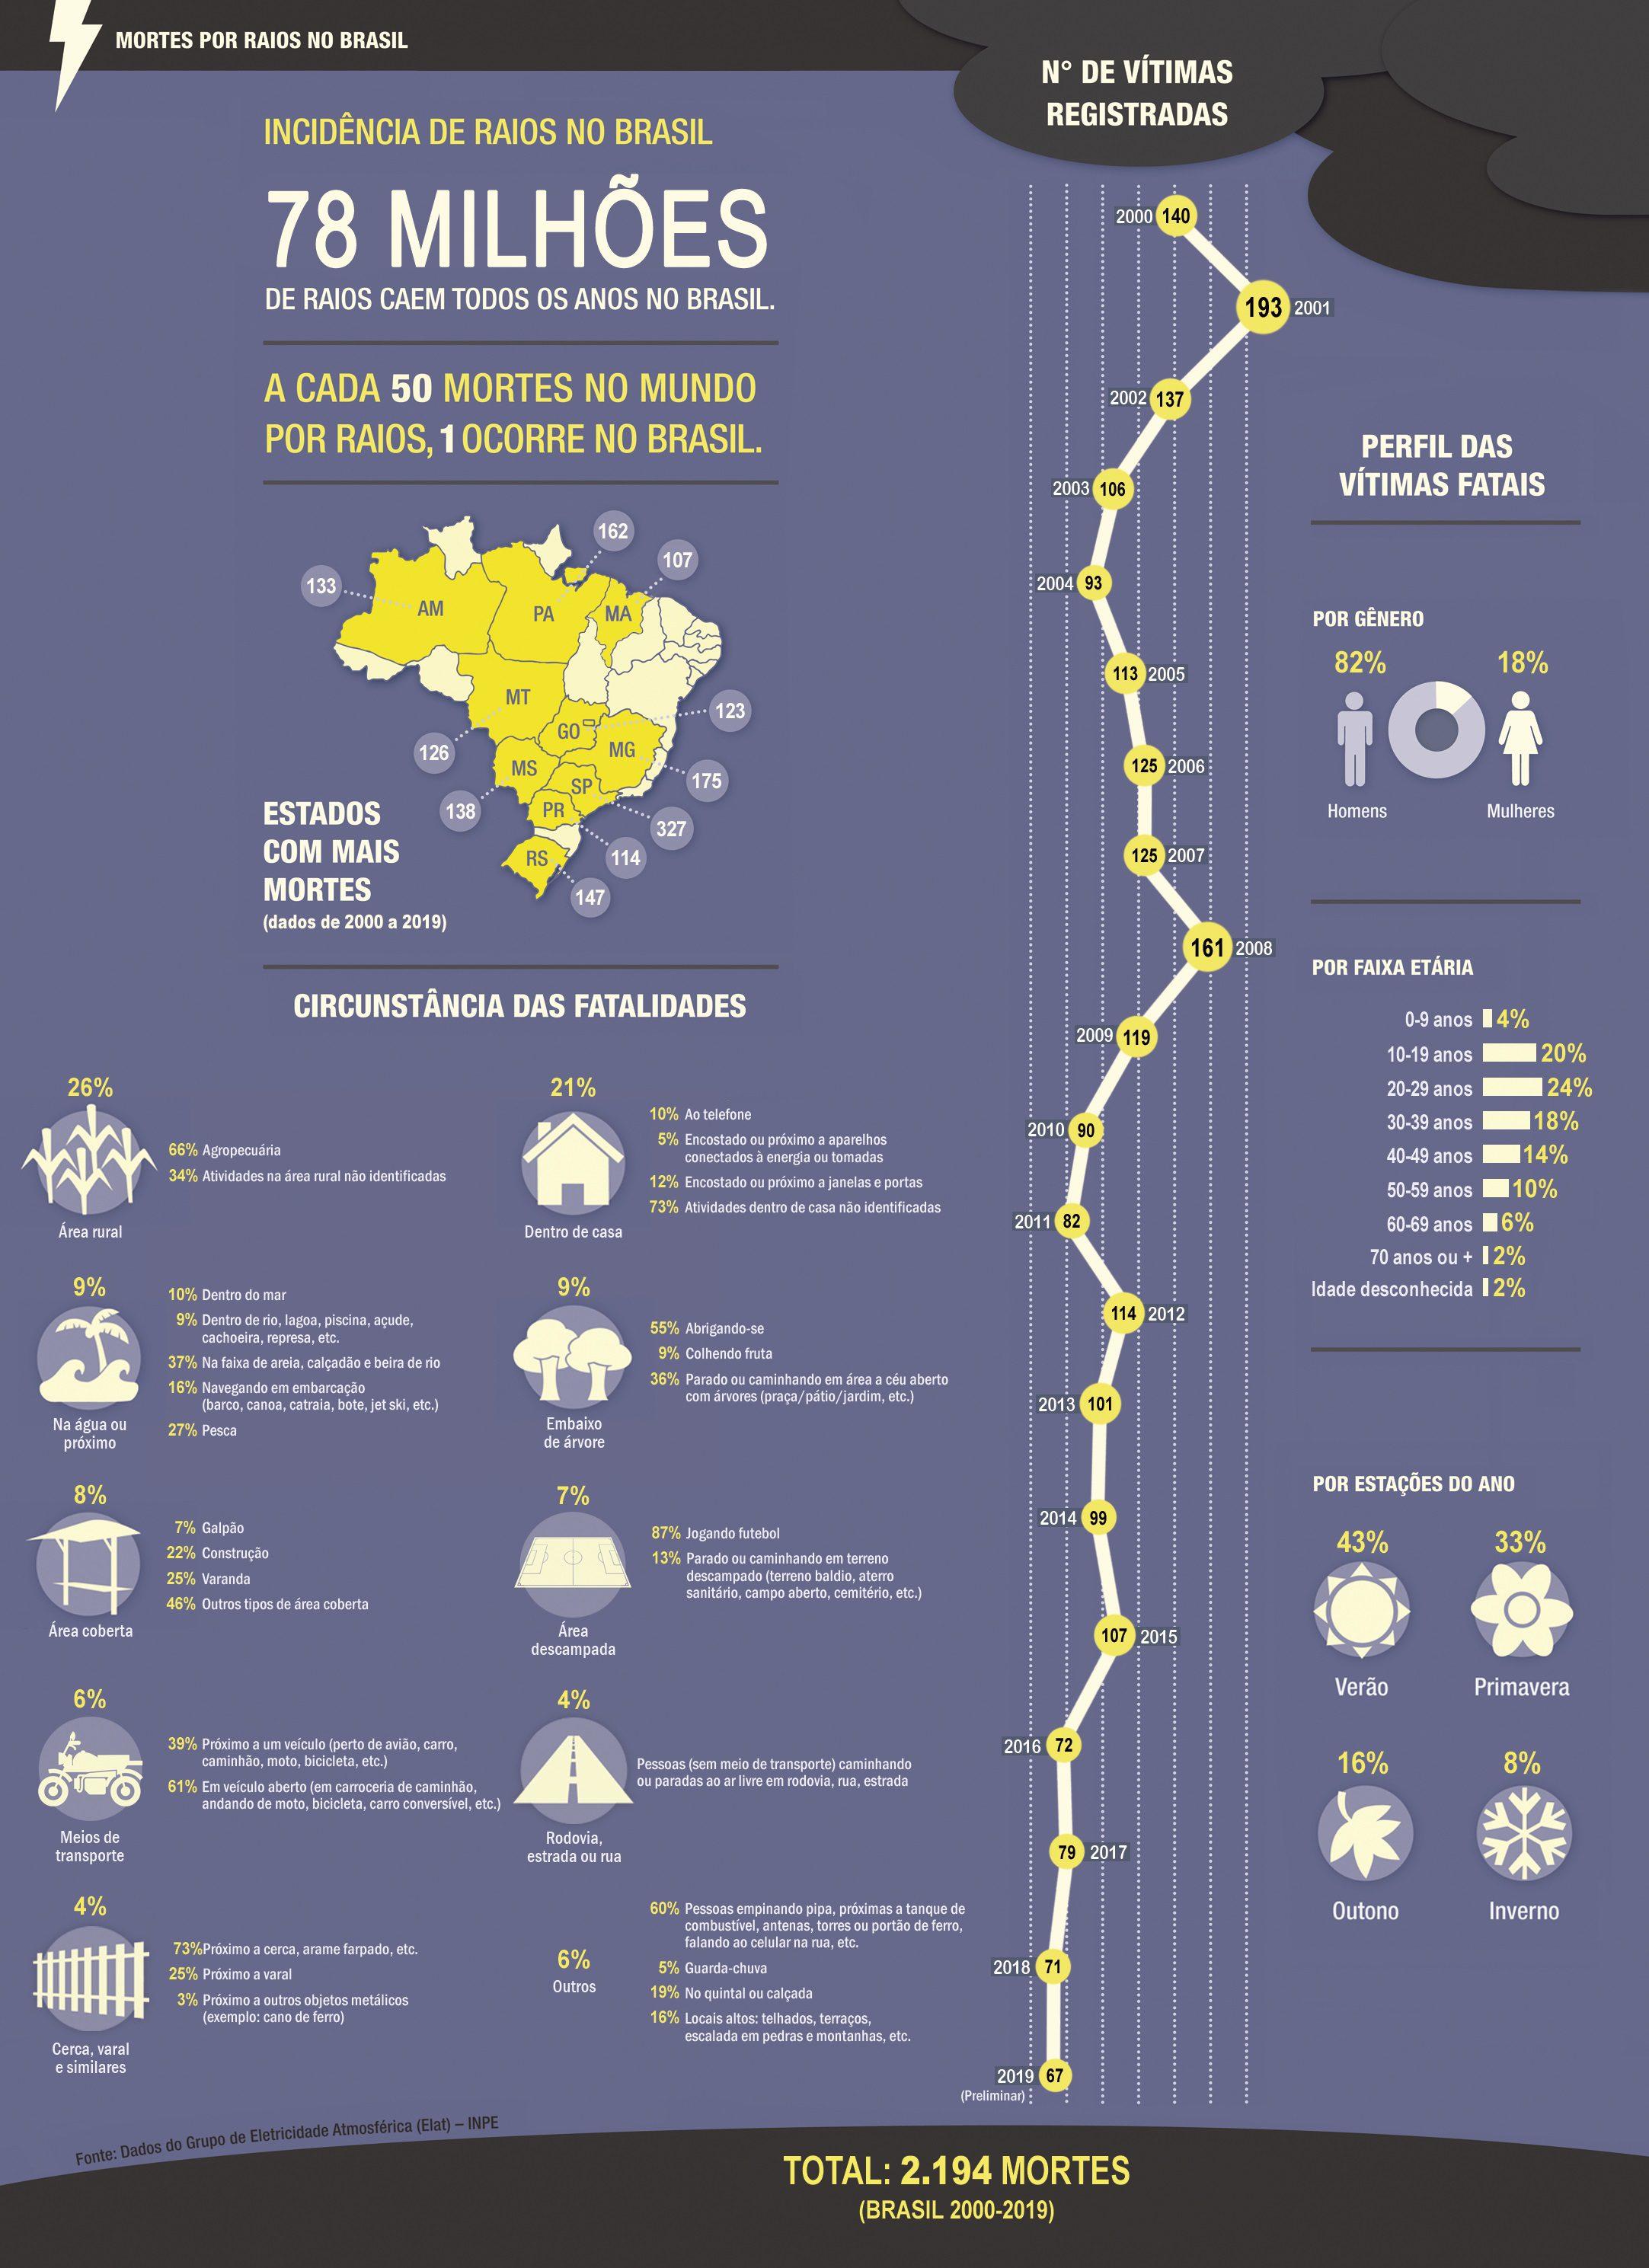 gráfico-de-incidencia-de-raios-no-brasil-eletrojr